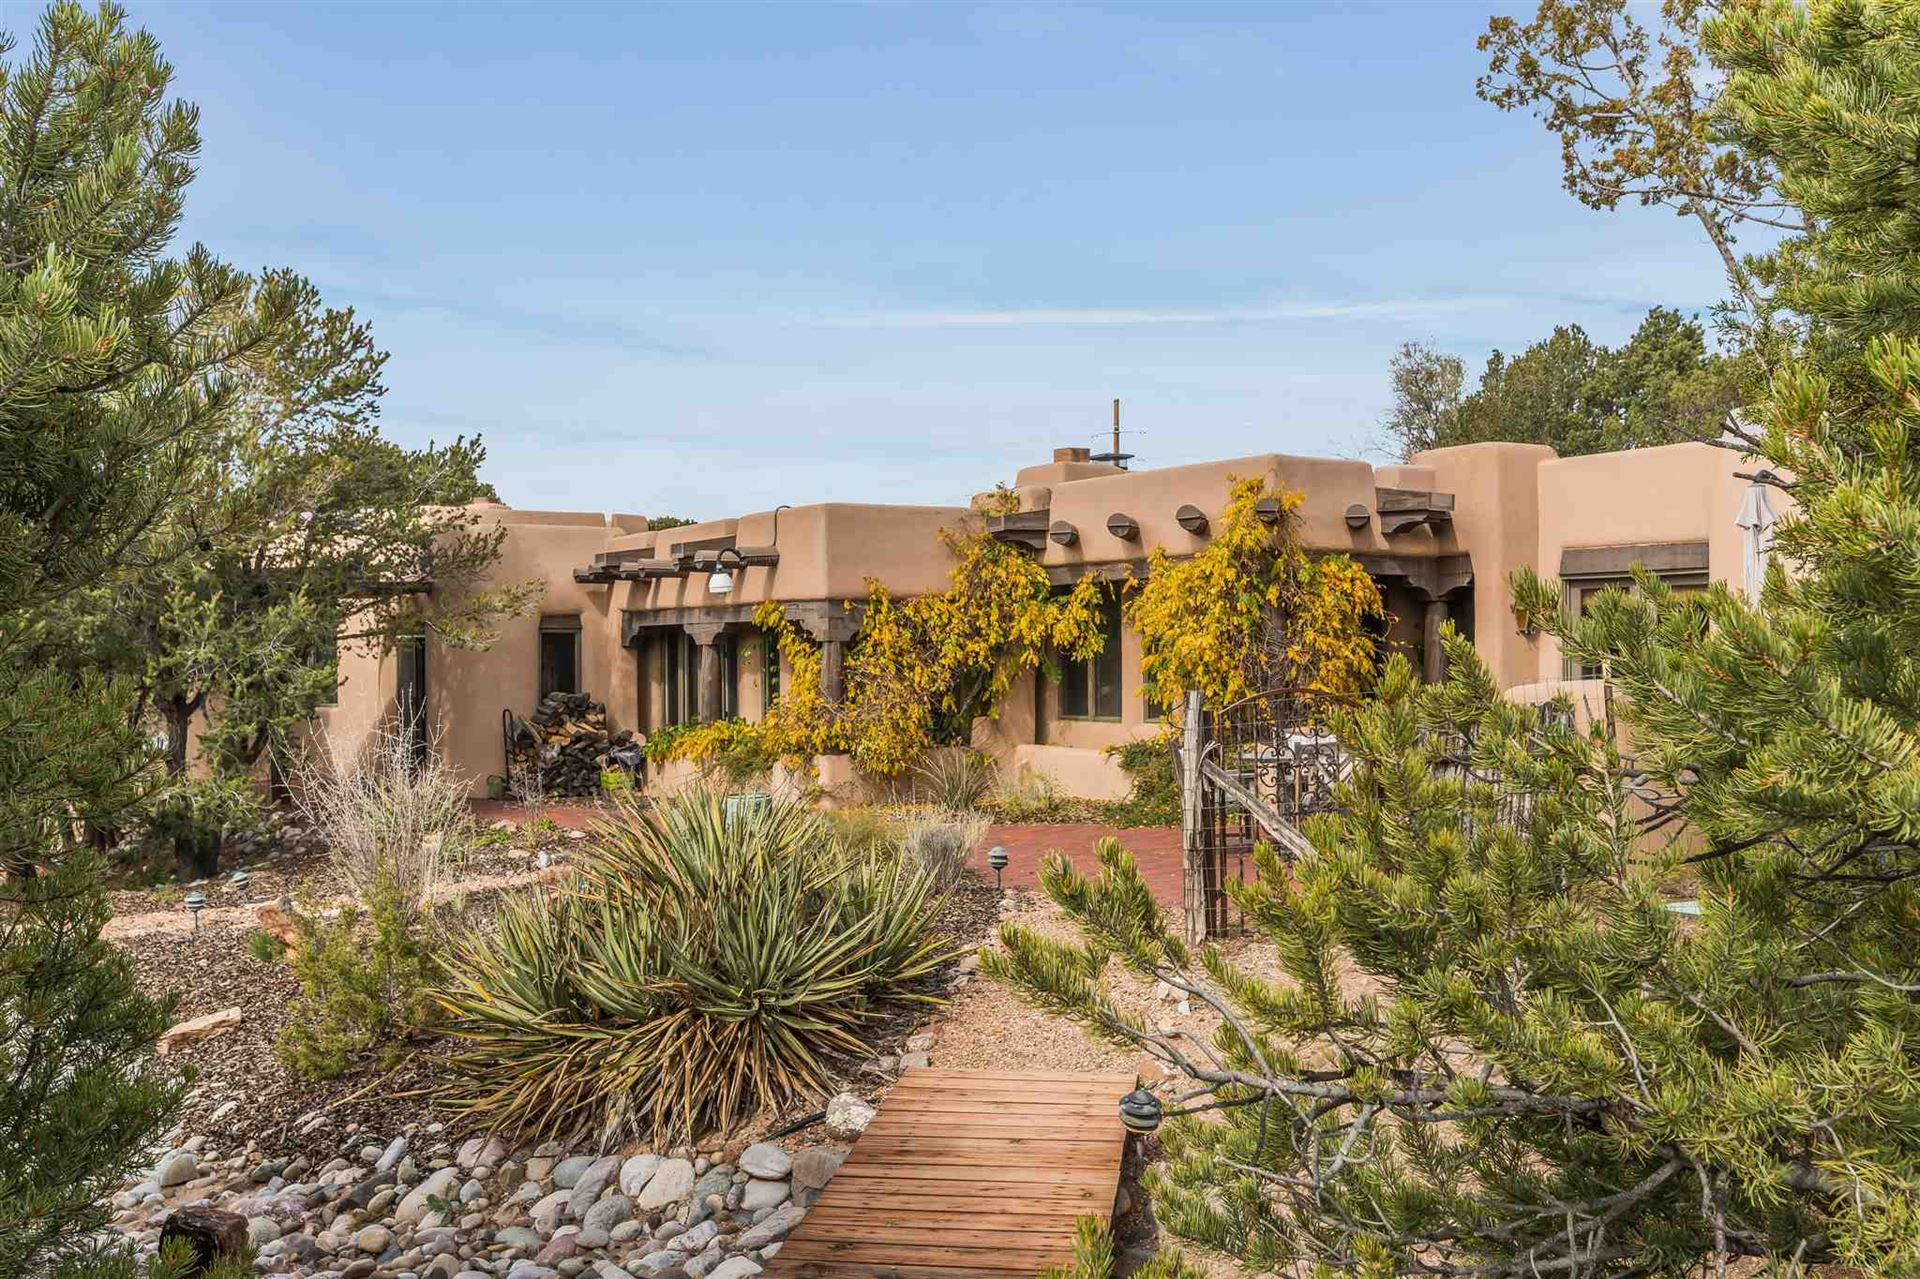 1304 Lejano Lane, Santa Fe, NM 87501 - #: 201901658